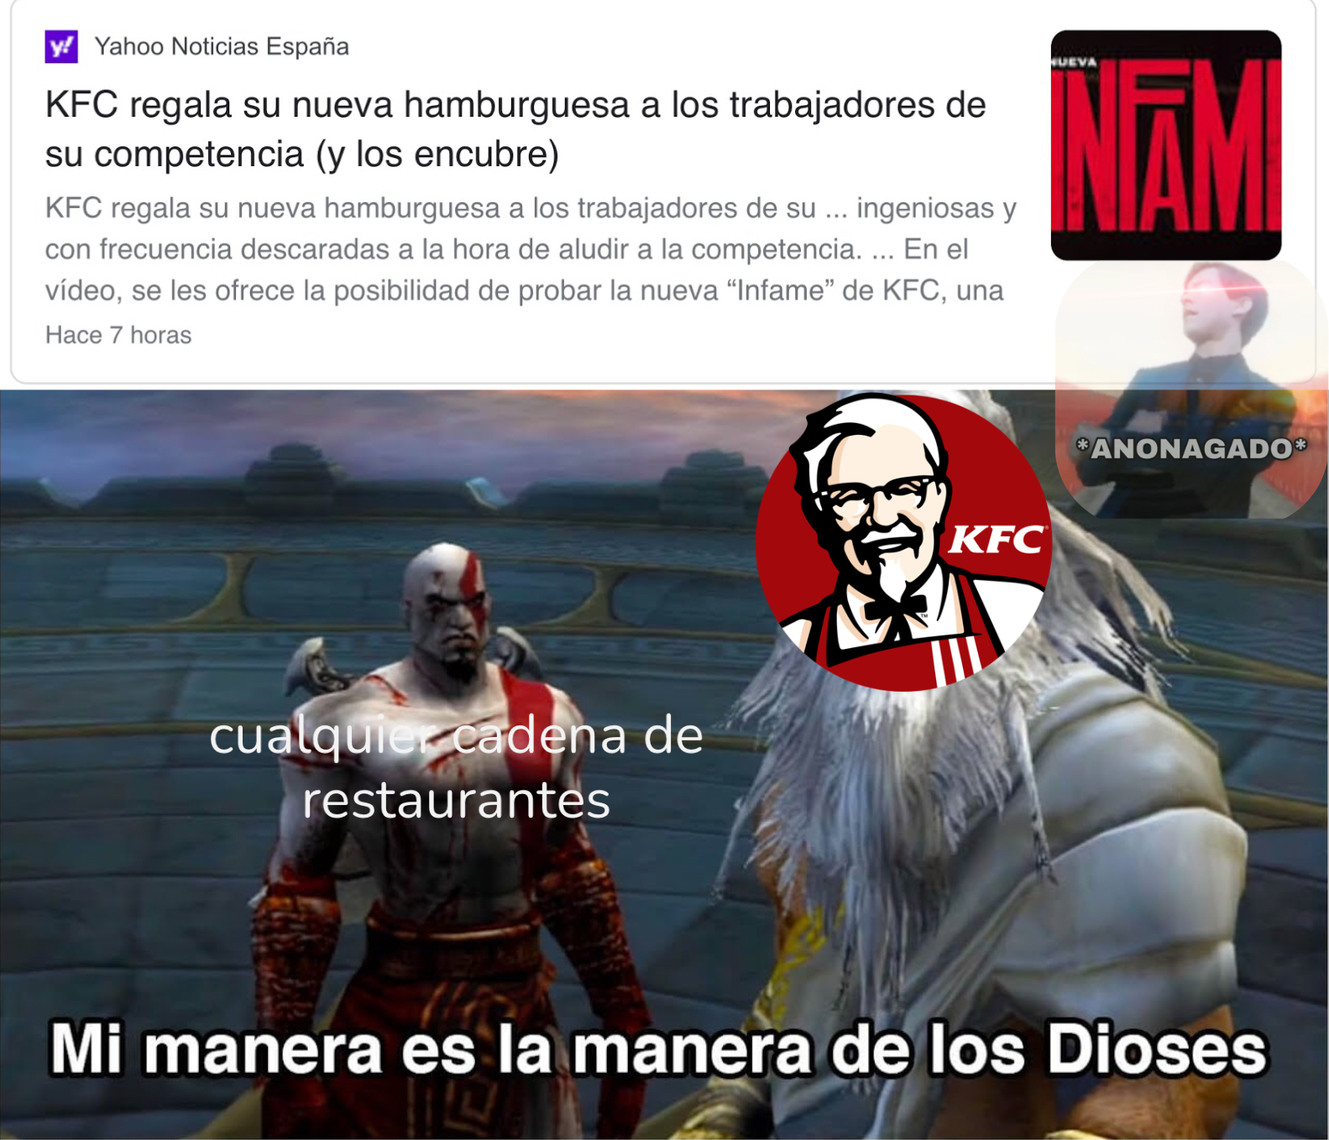 KFC no supera a la competencia, la destruye, LA HUMILLA - meme